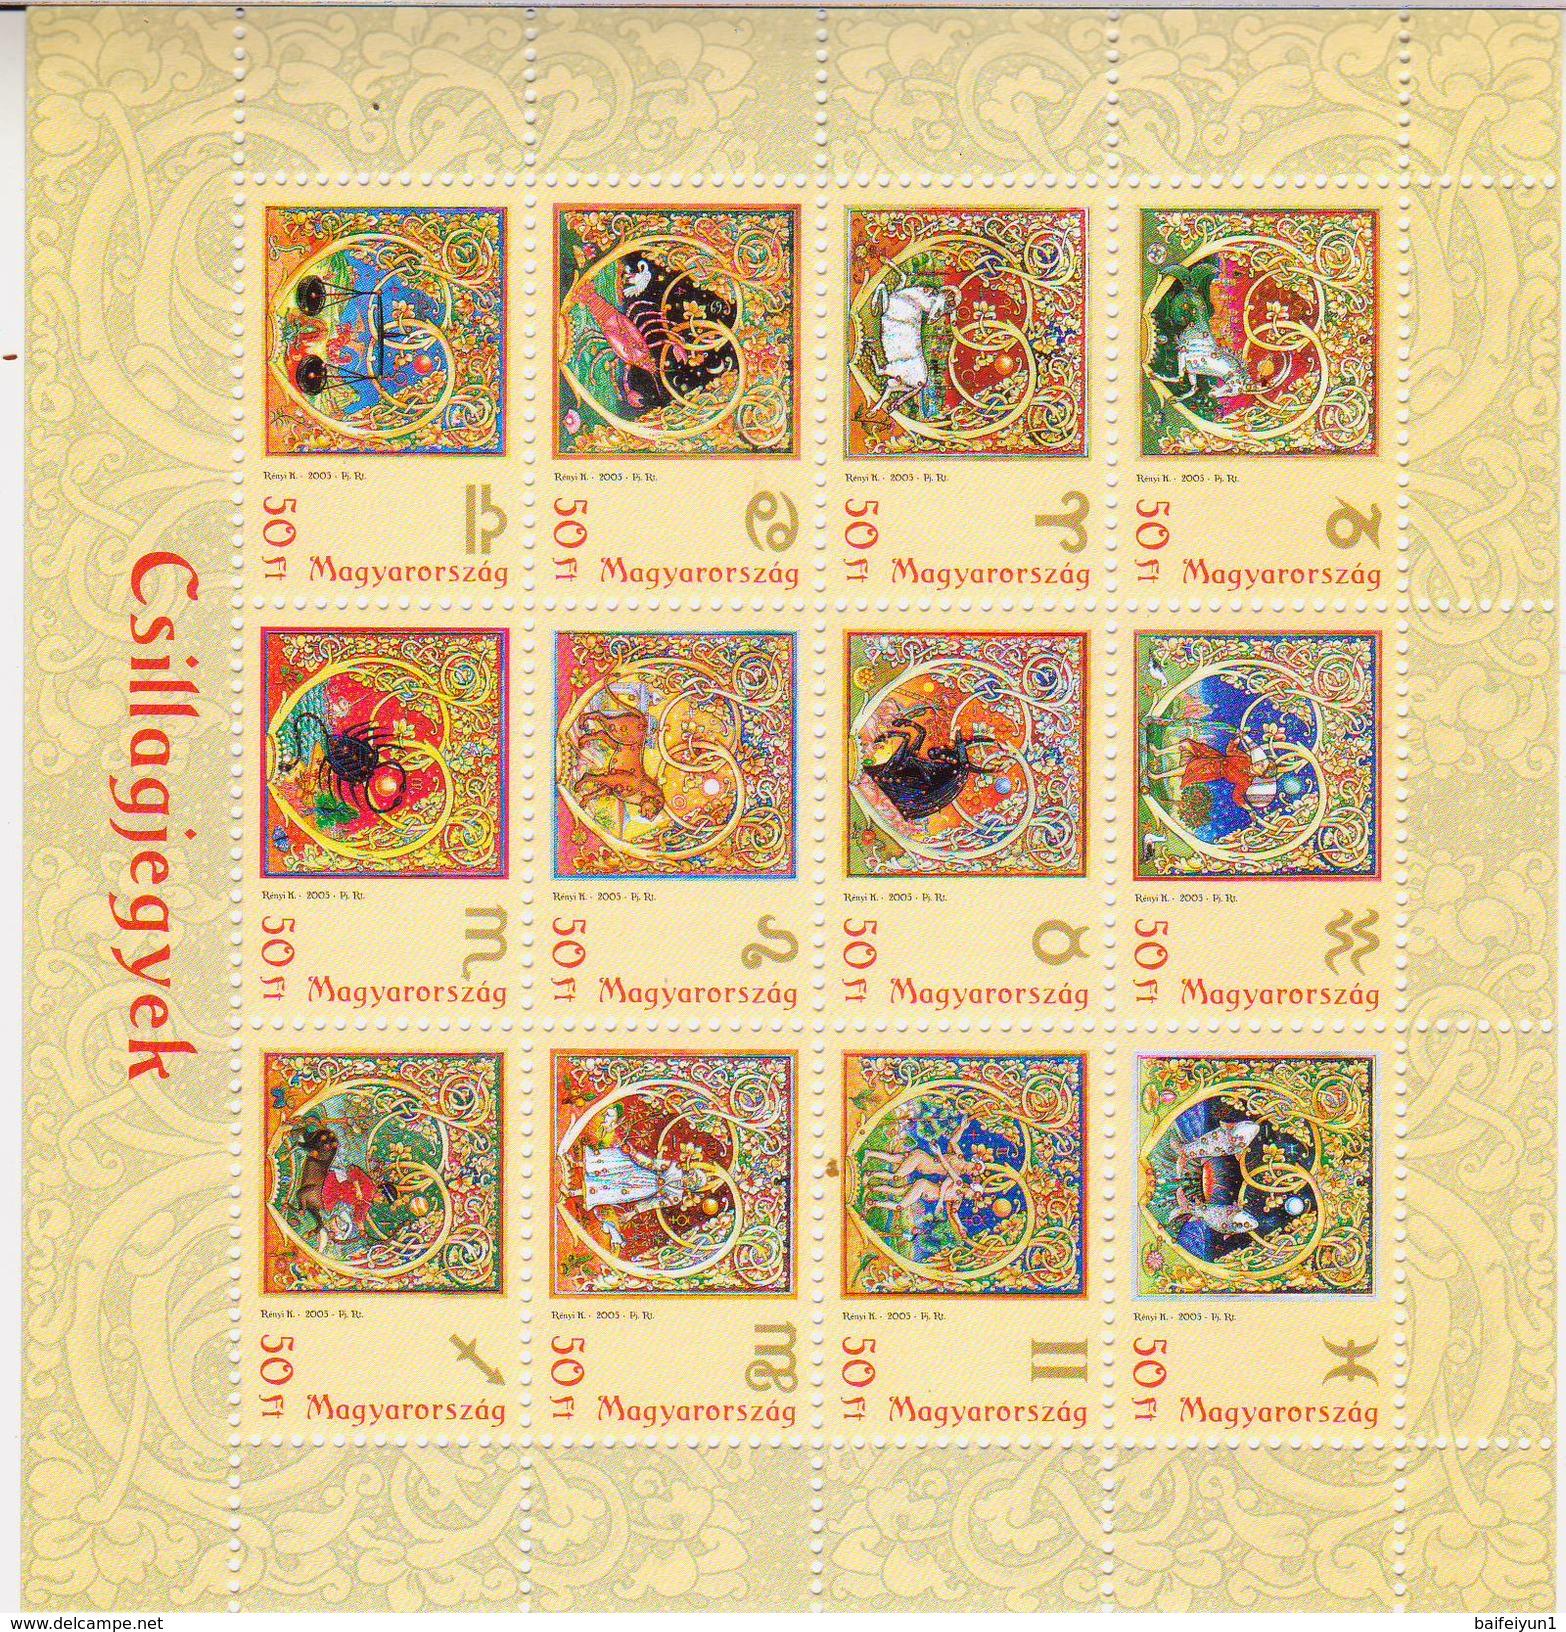 2005 HUNGARY Zodiac Sheetlet - Astrology